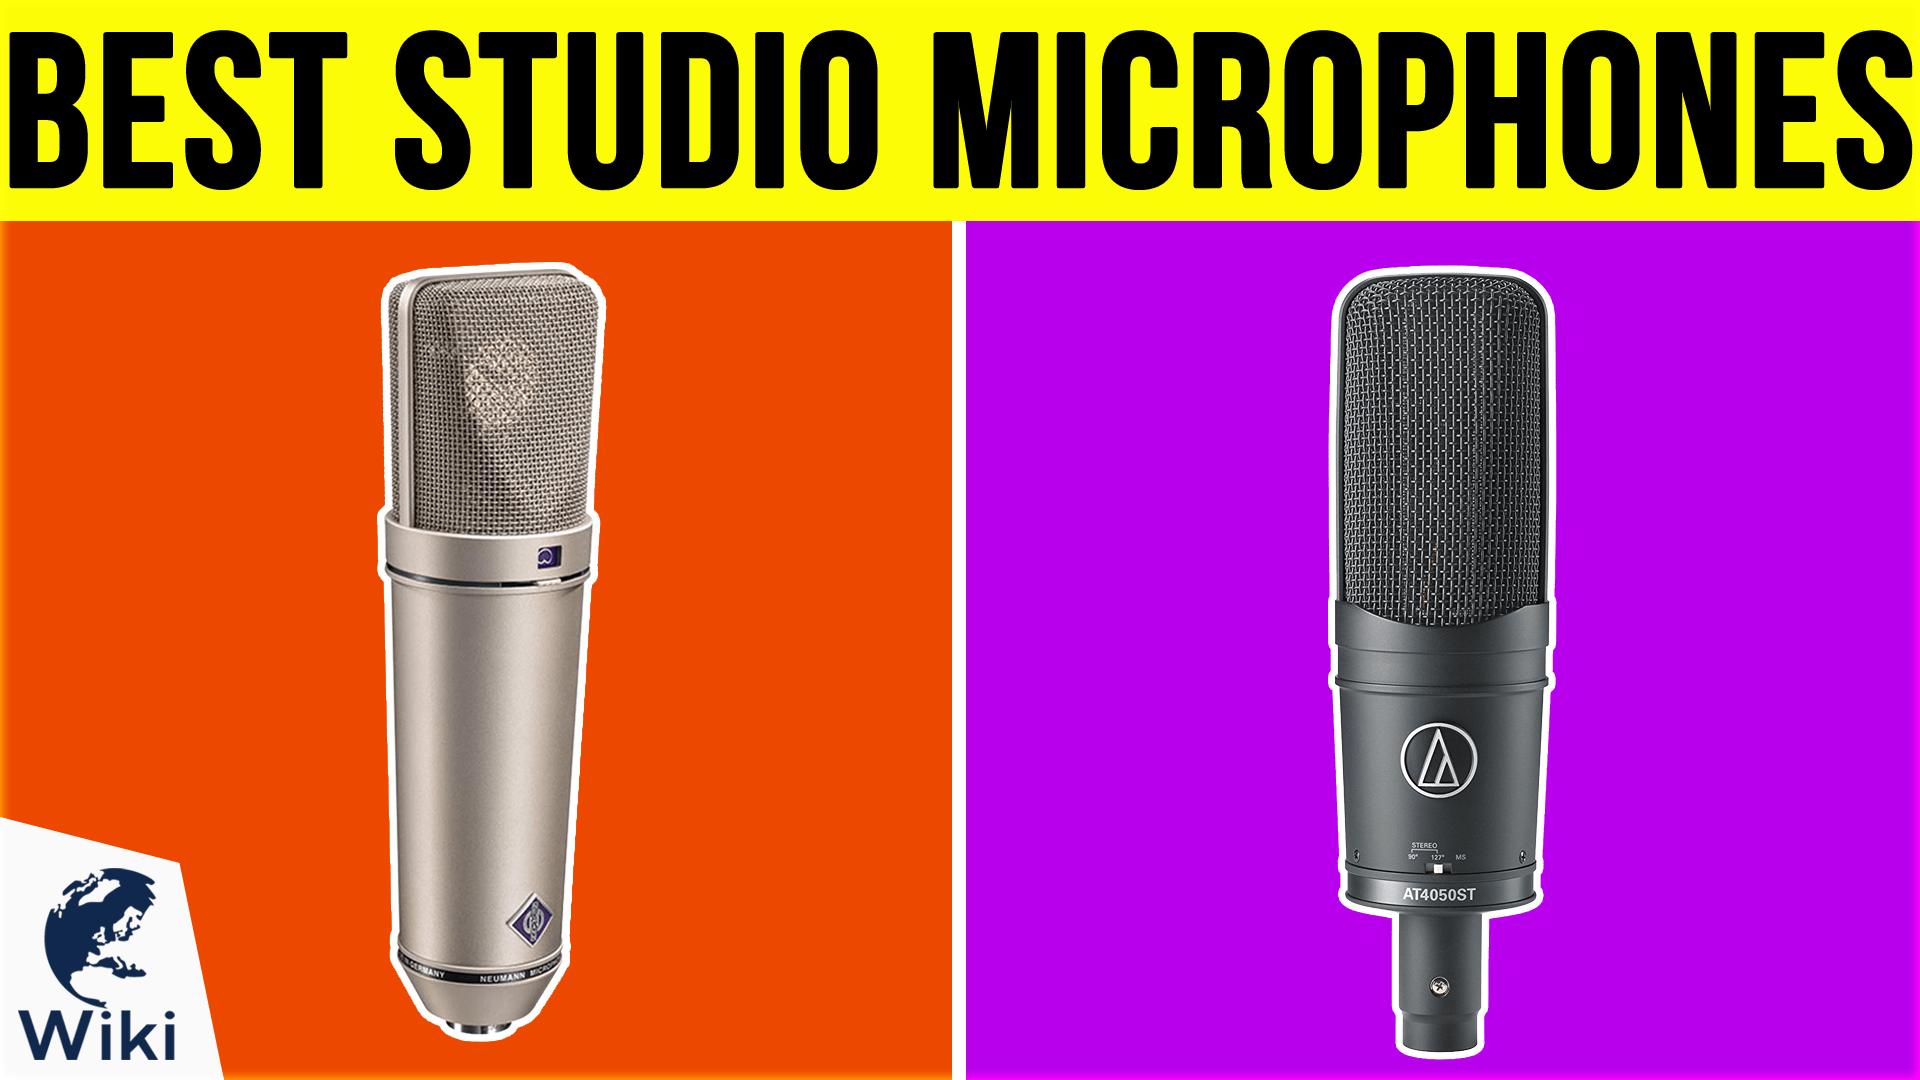 1//8 TRS Plug Pro JK/® MIC-J 044 Lavalier Lapel External Microphone Designed For ZOOM TASCAM Recording Devices